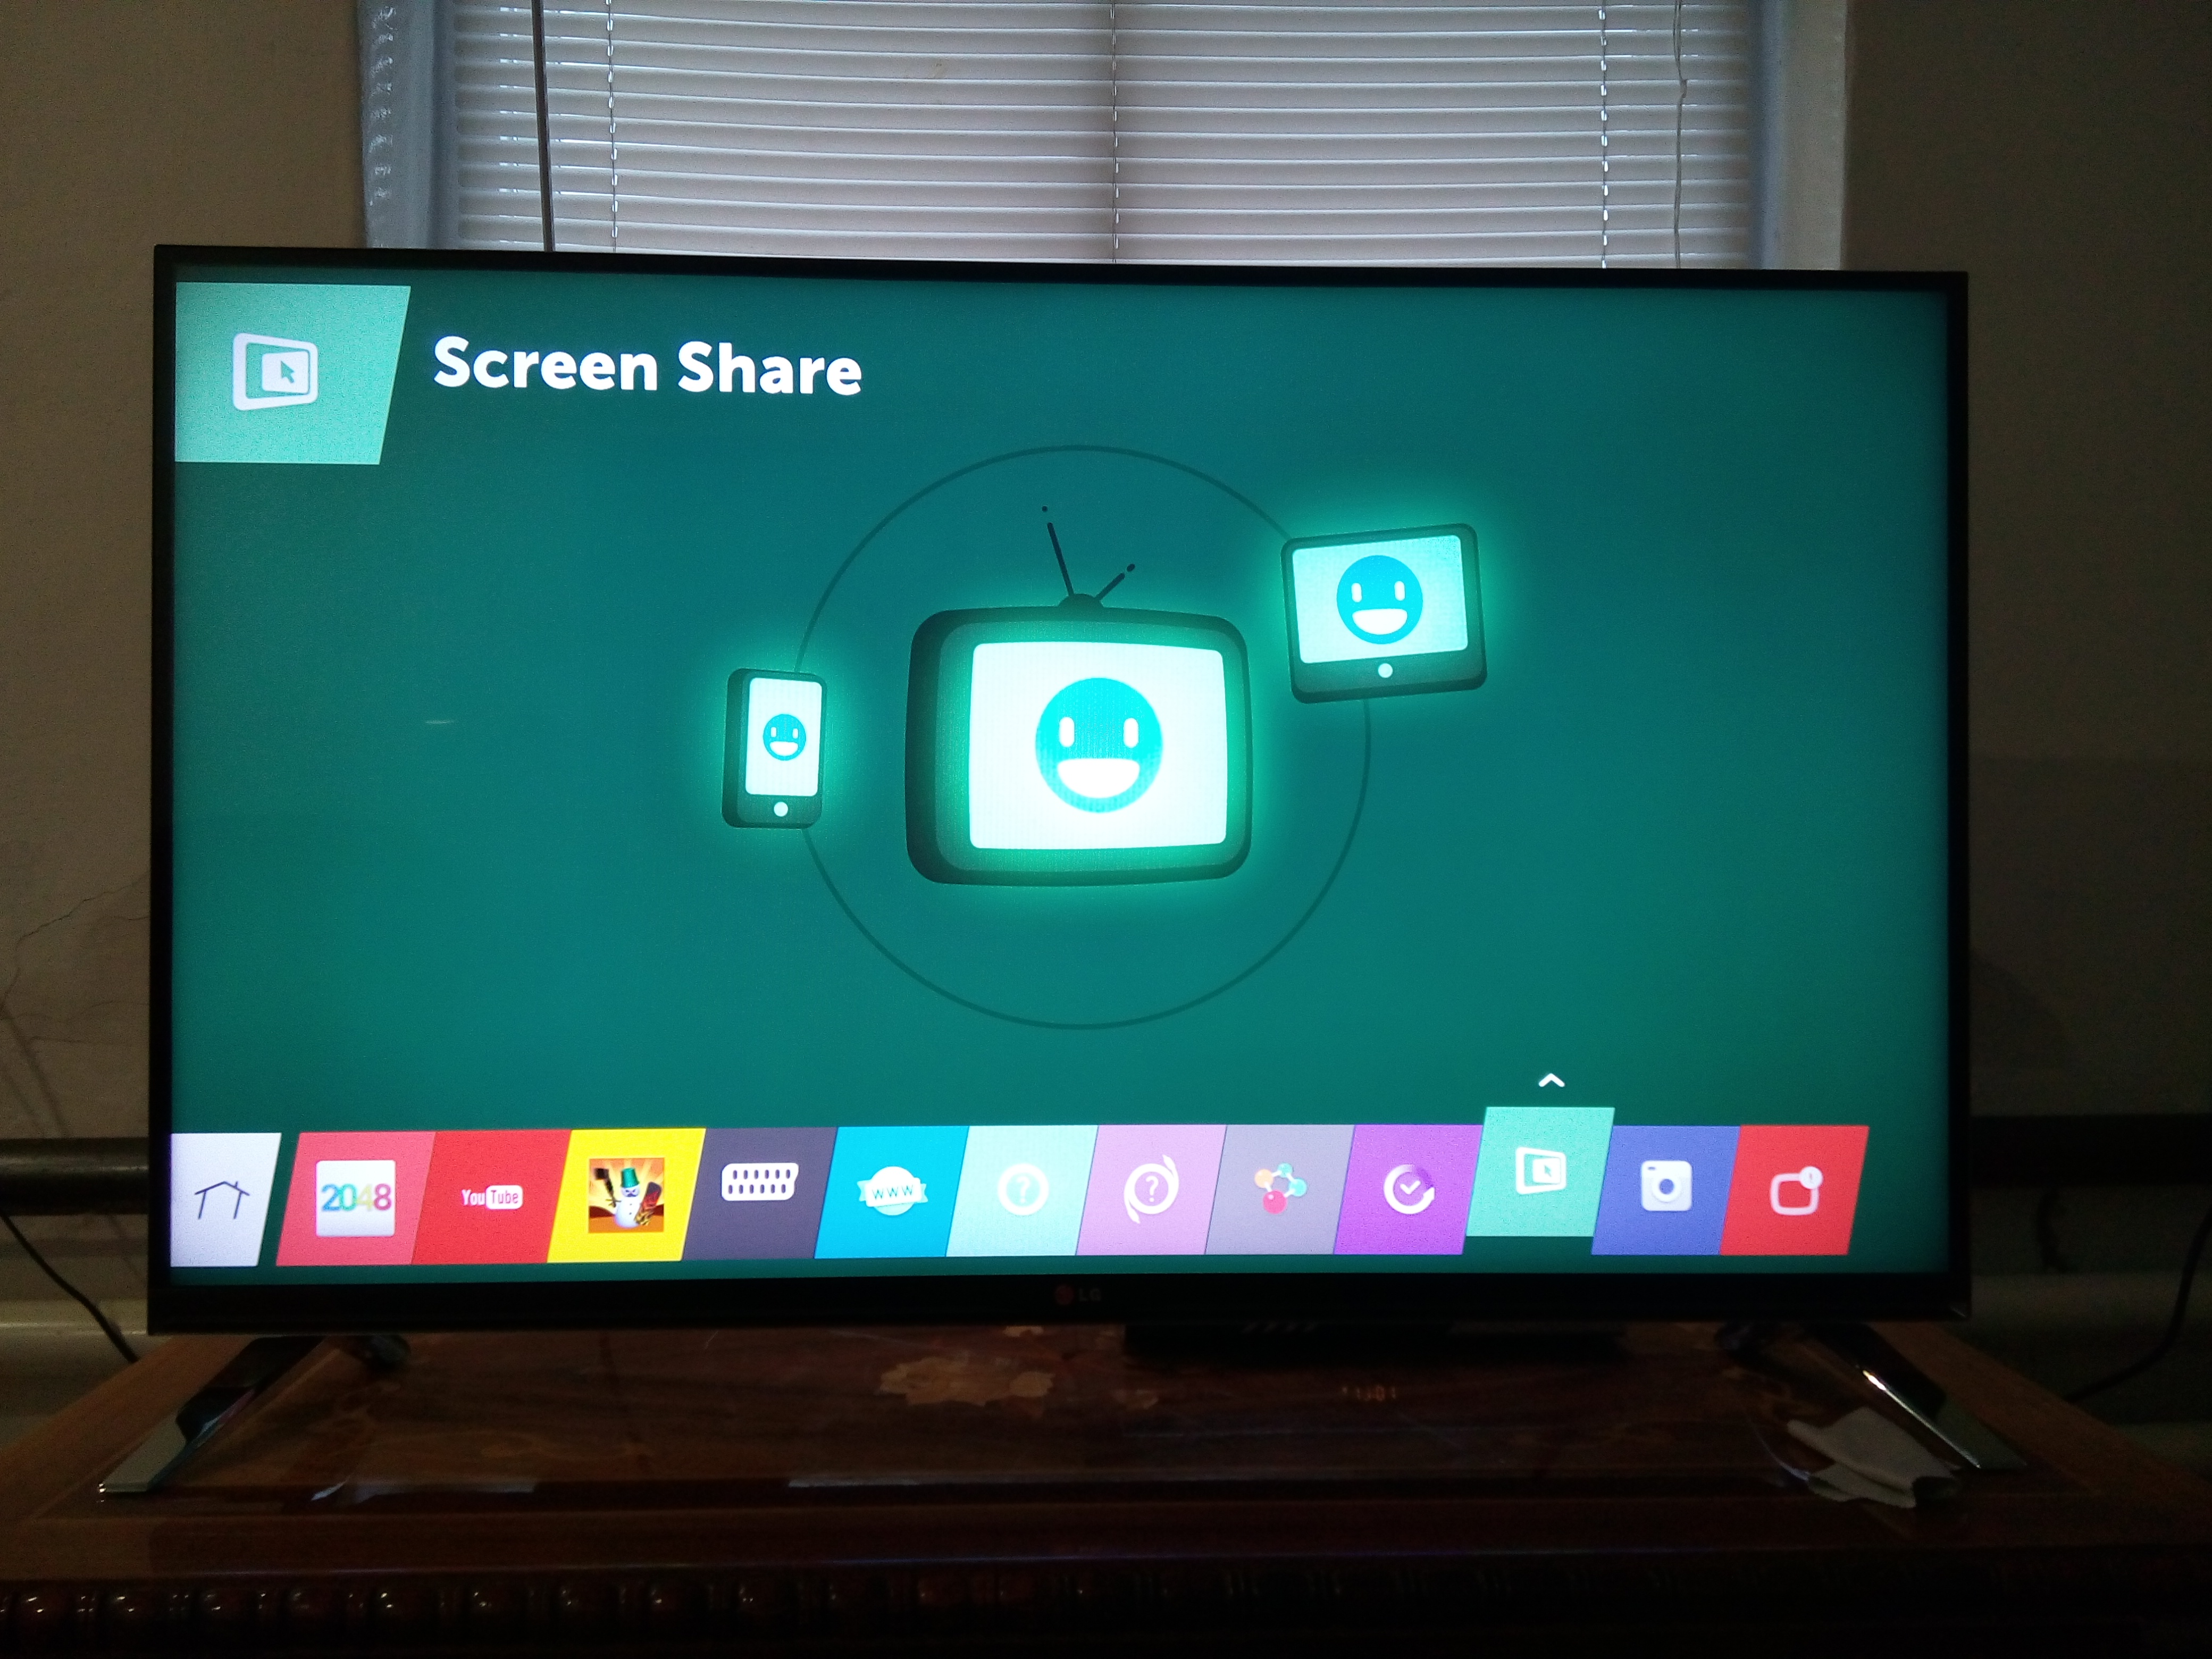 Как подключить компьютер к телевизору через Wi-Fi